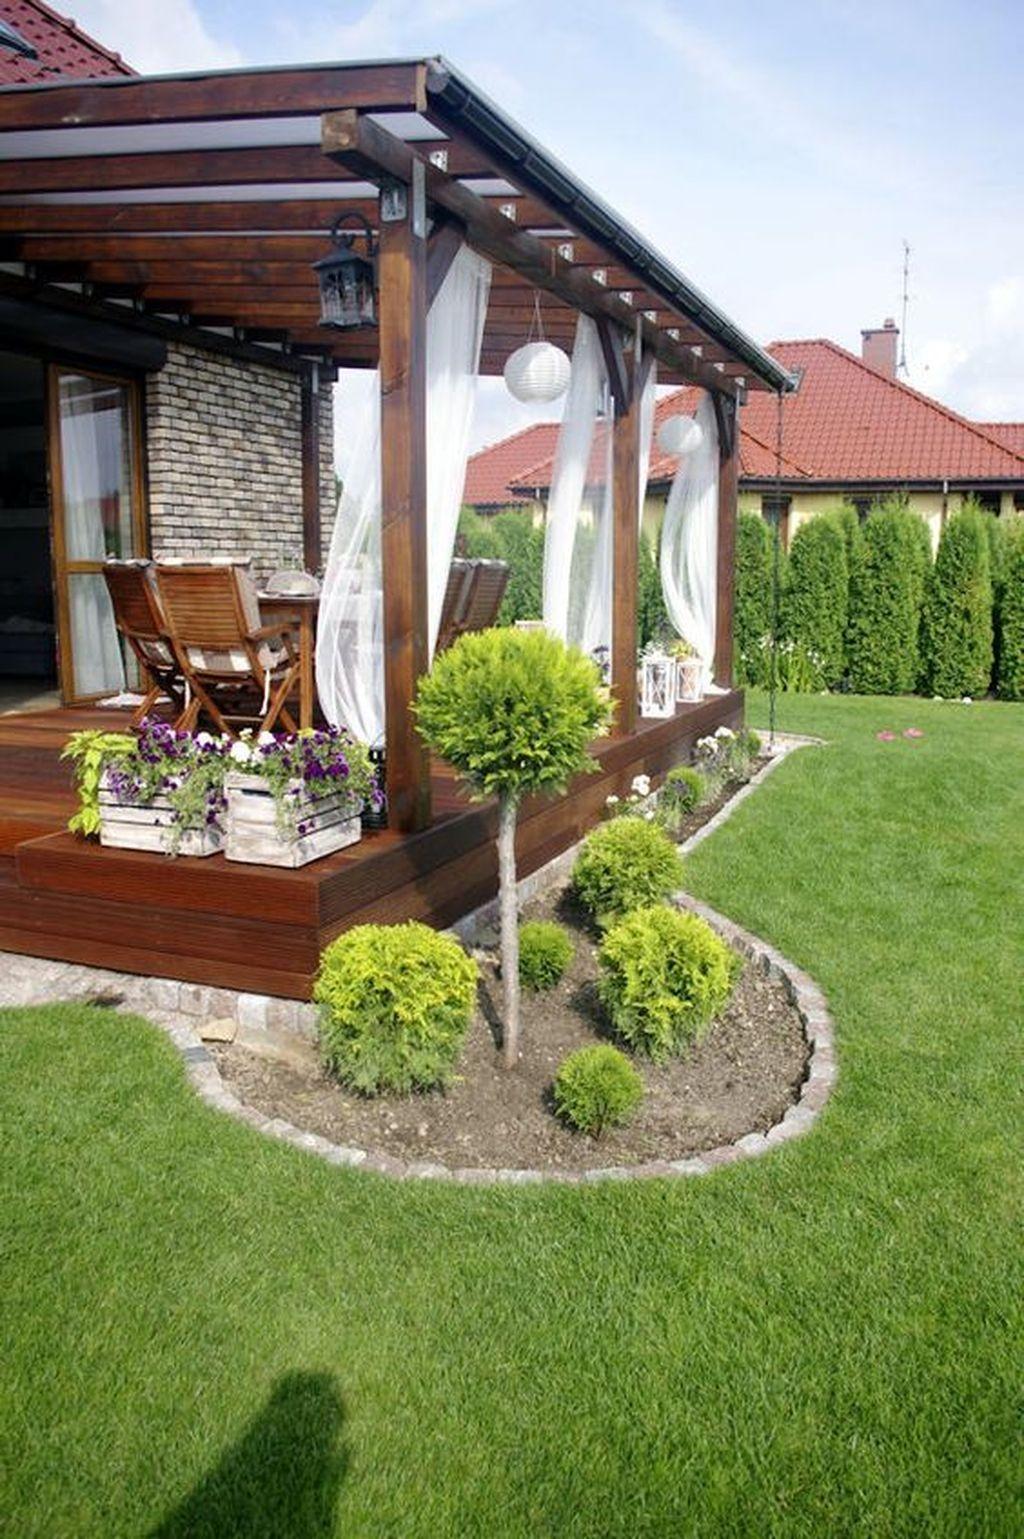 Popular Small Backyard Patio Design Ideas 35 - HOMYHOMEE on Patio Cover Ideas For Small Backyards id=21863